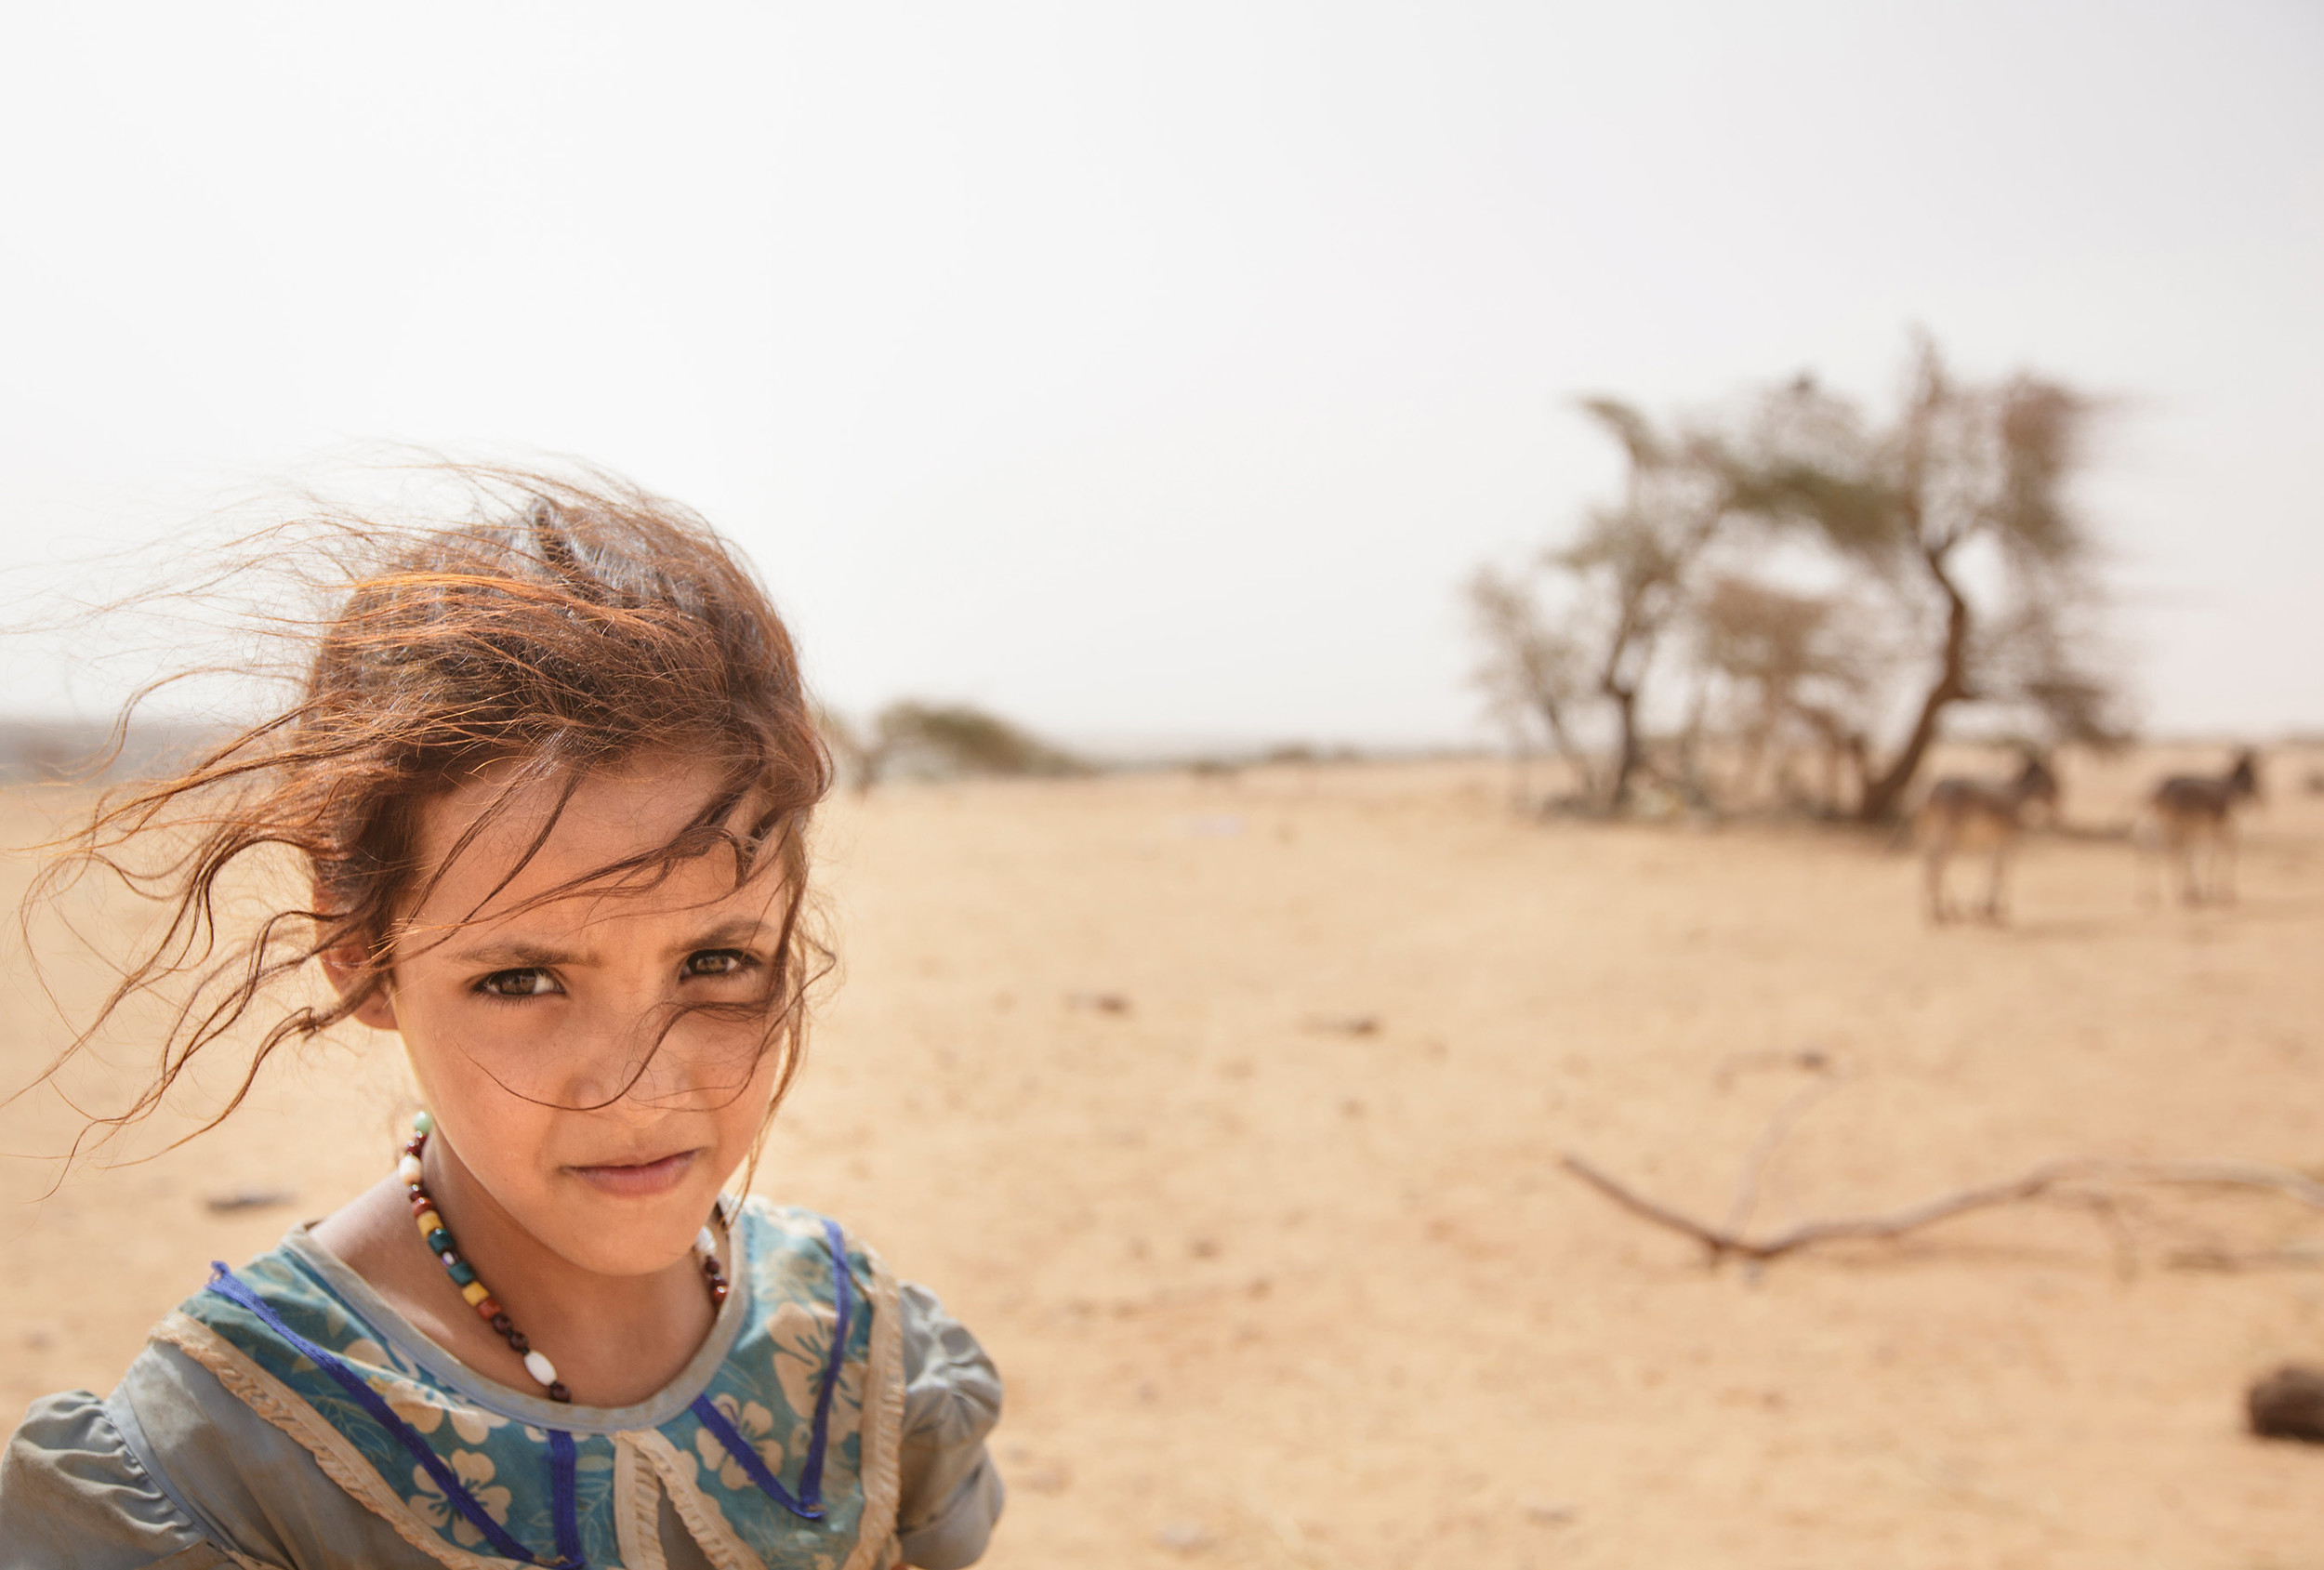 Mauritanian village girl in the desert.